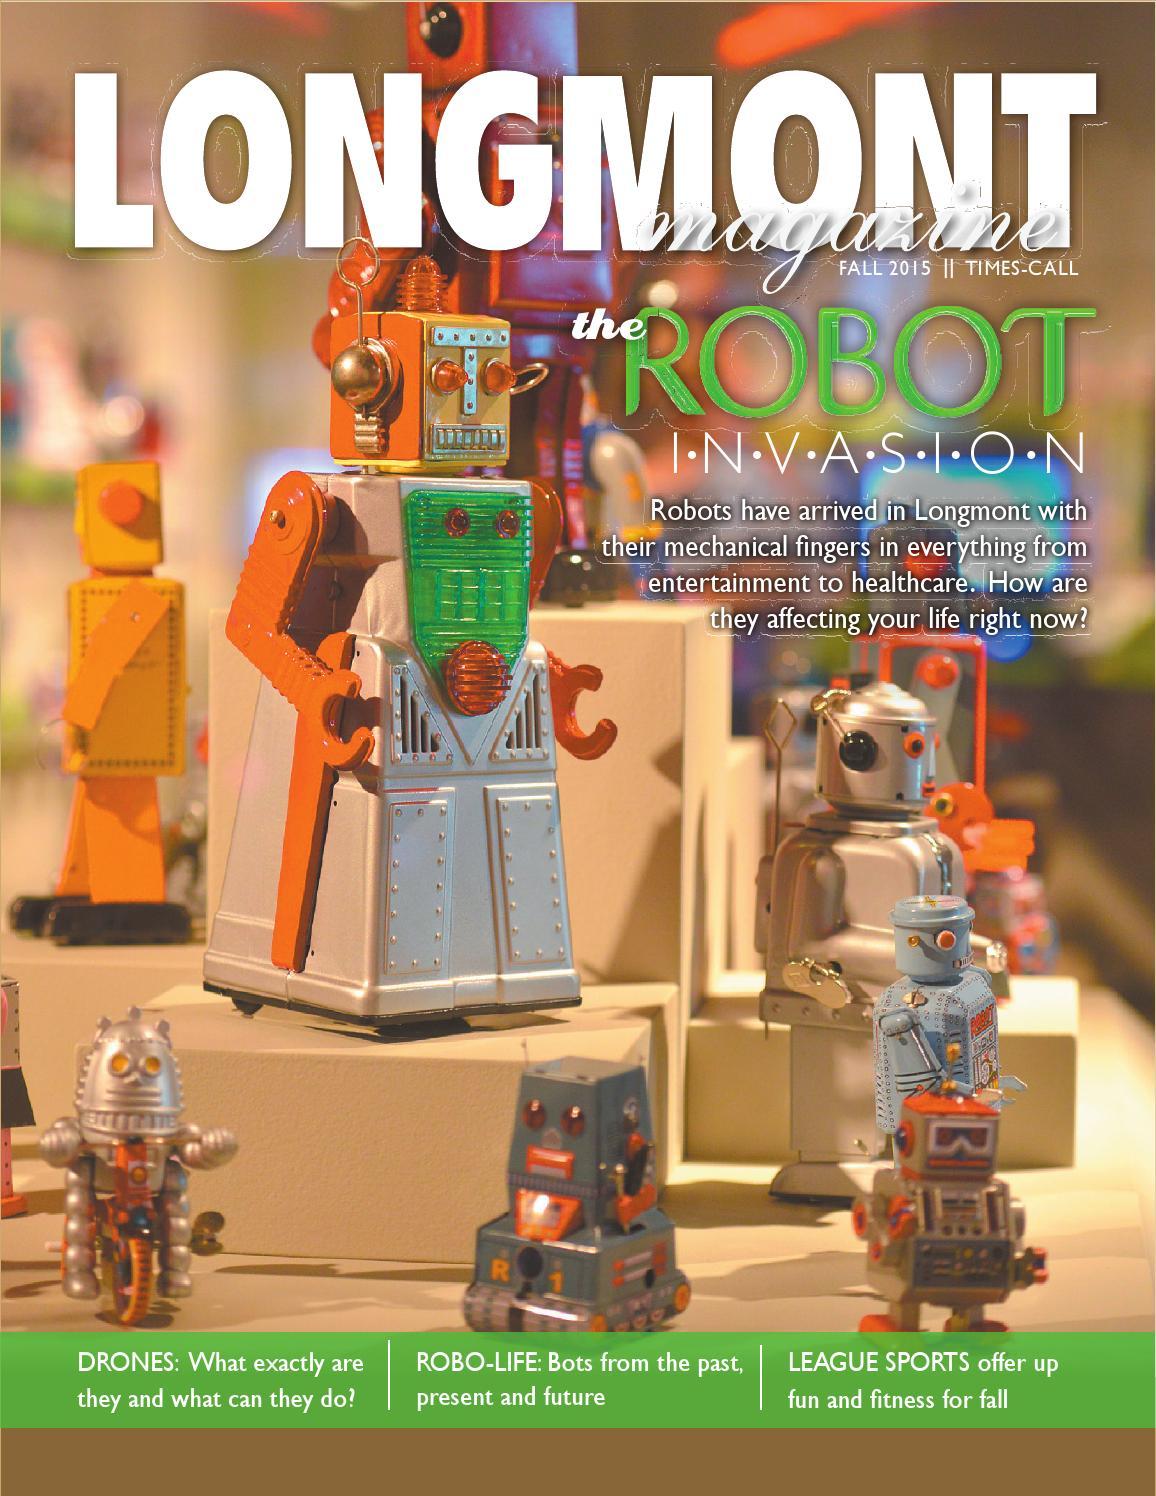 Longmont Magazine Fall 2015 by Times-Call Newspaper - issuu